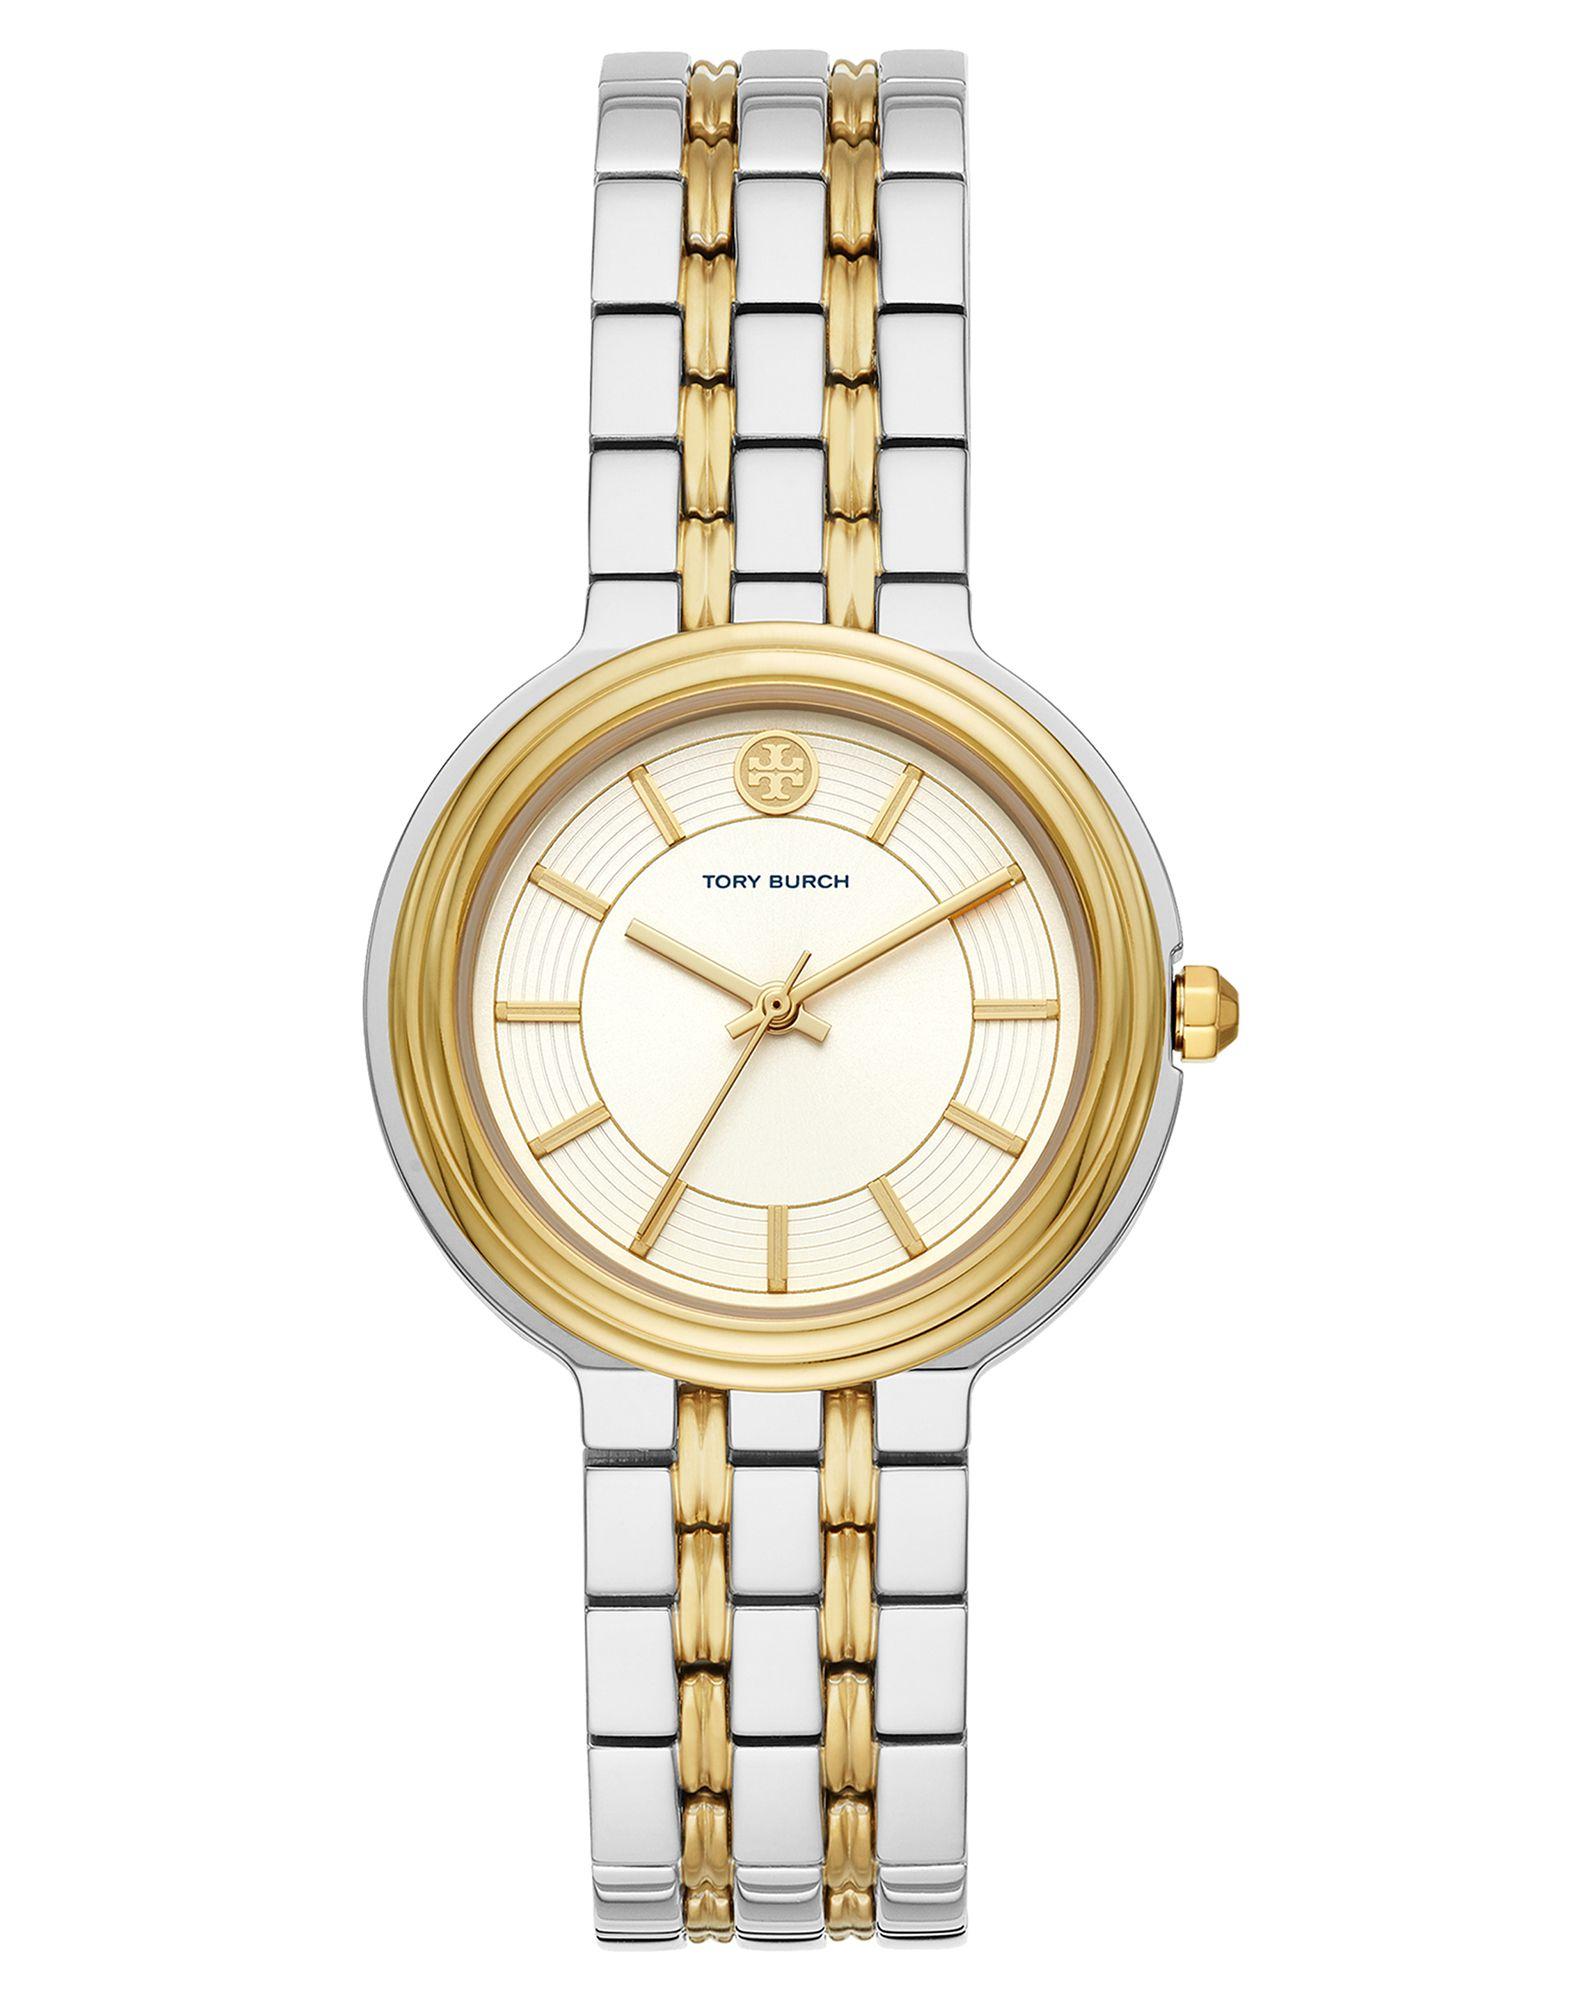 TORY BURCH Wrist watches - Item 58049495